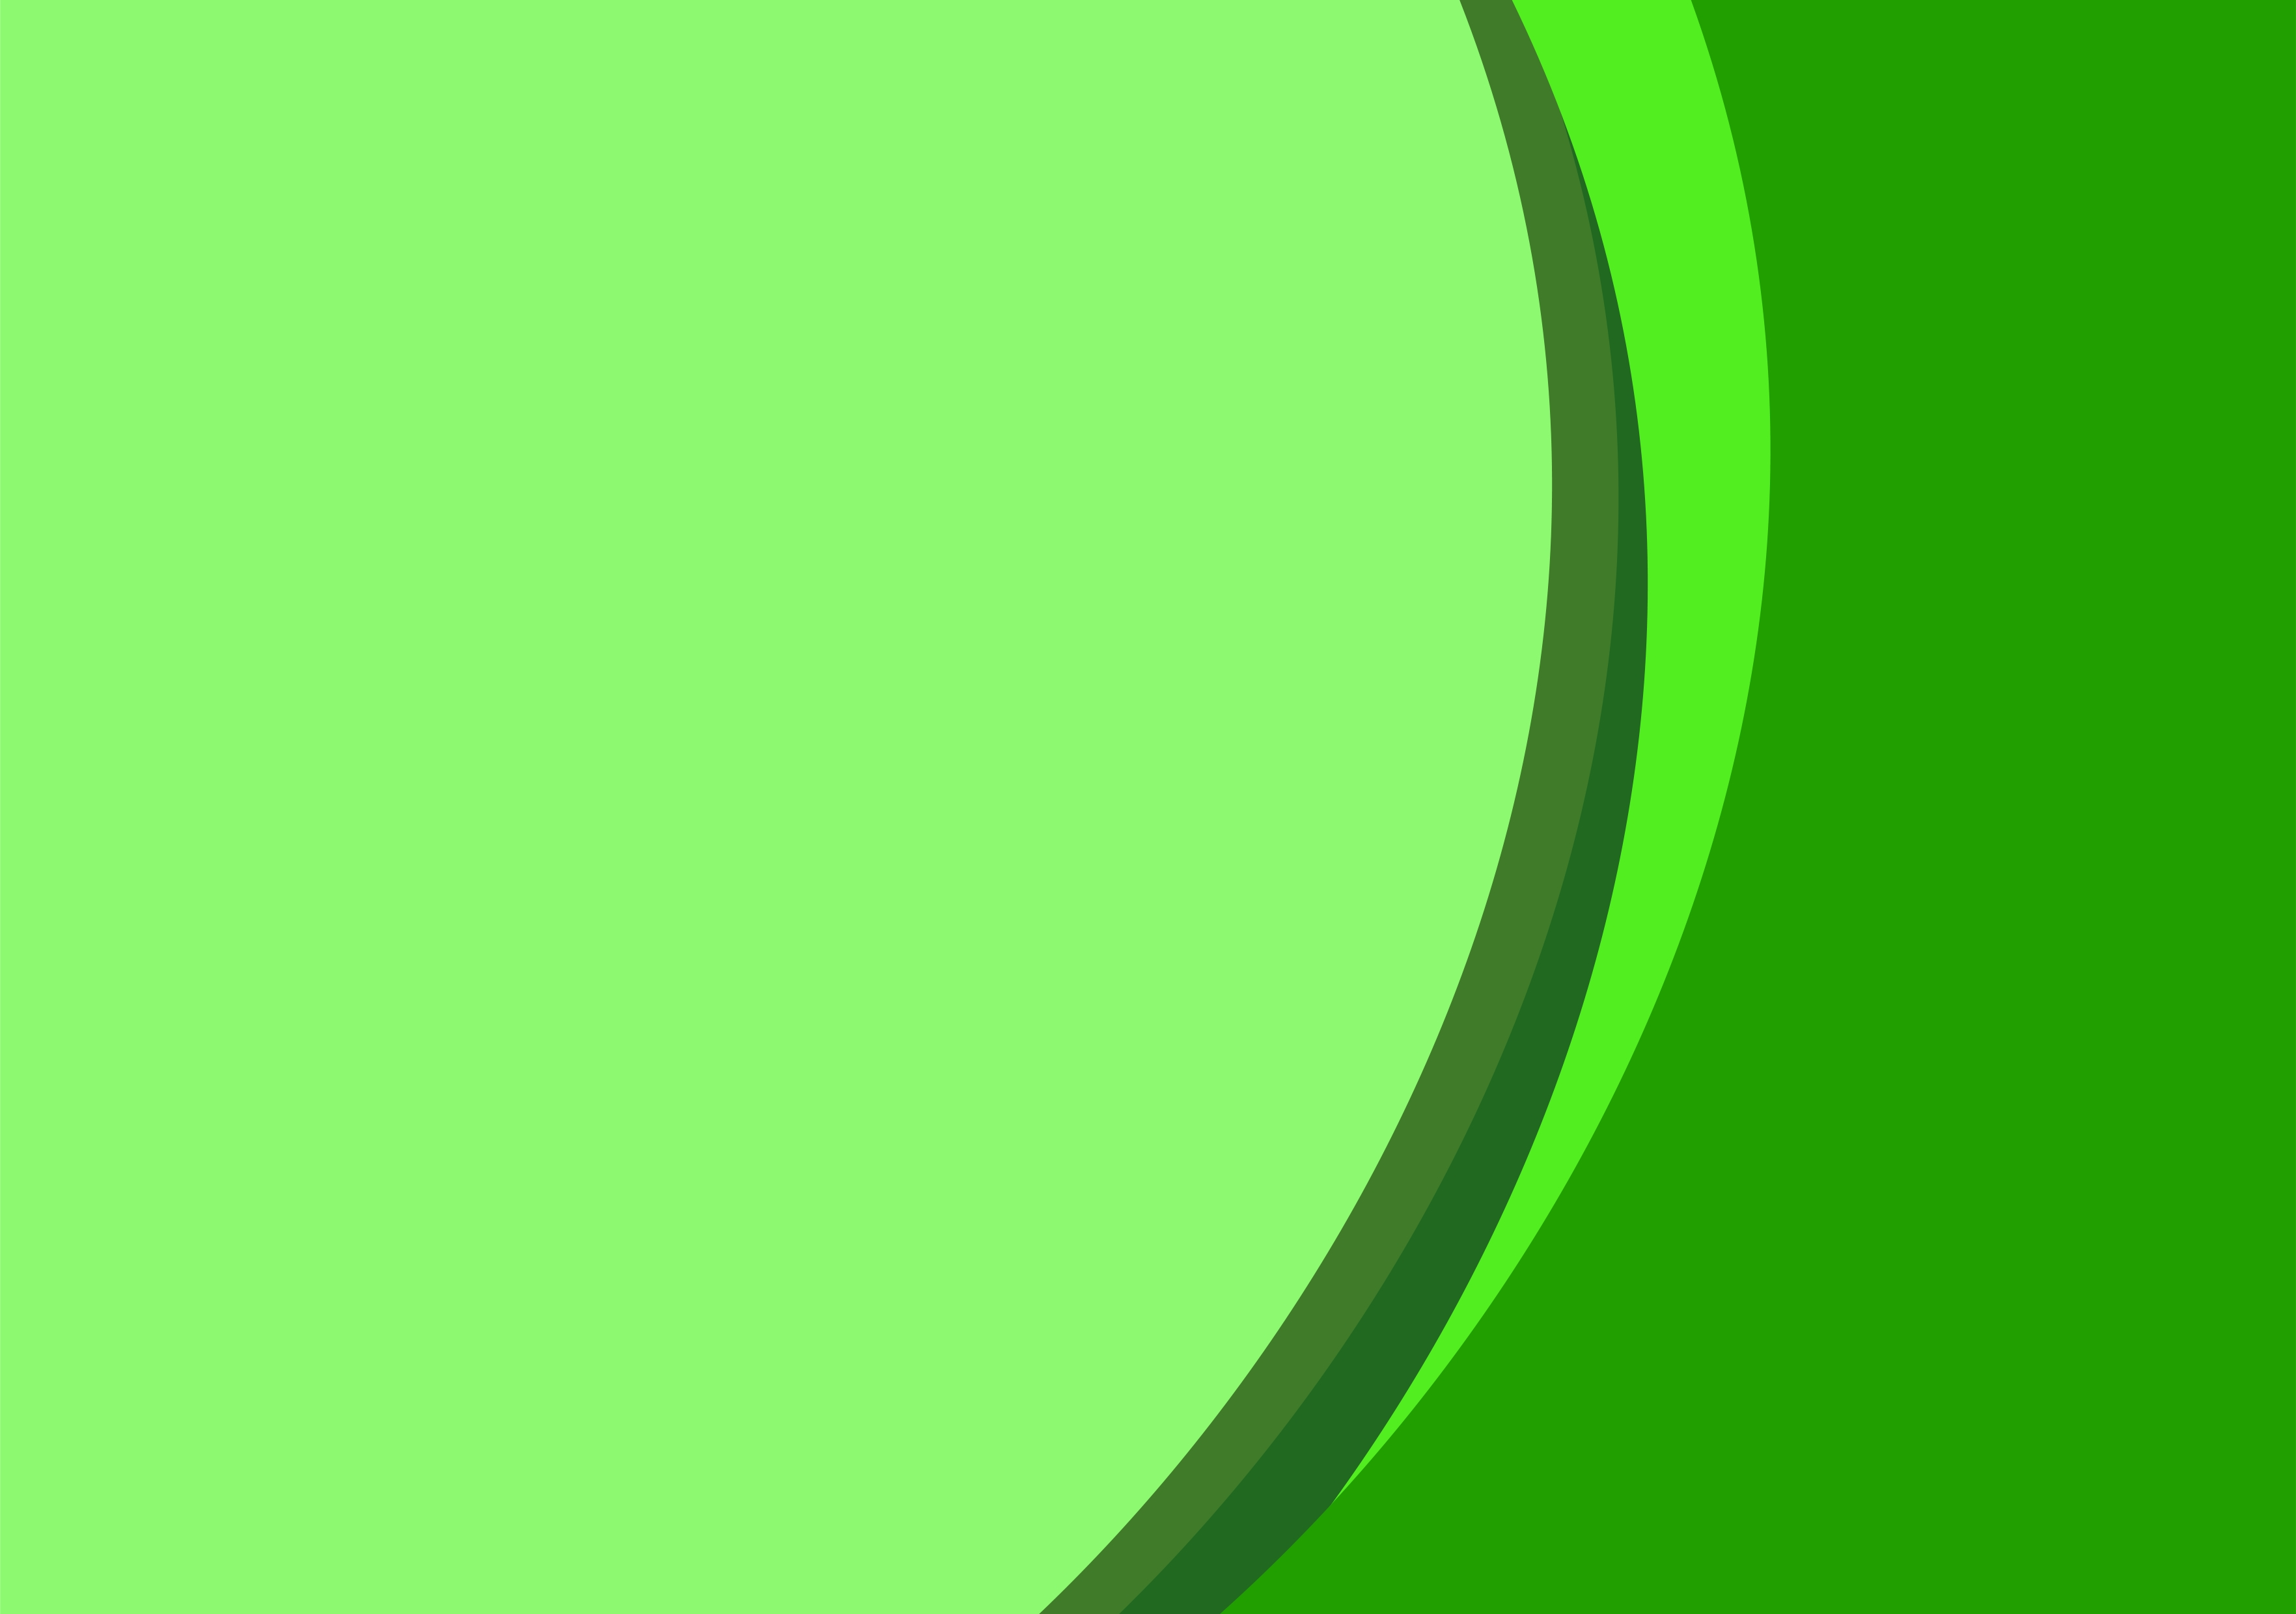 Simple Green Wallpapers HD 6849 Wallpaper Cool Walldiskpapercom 3527x2480